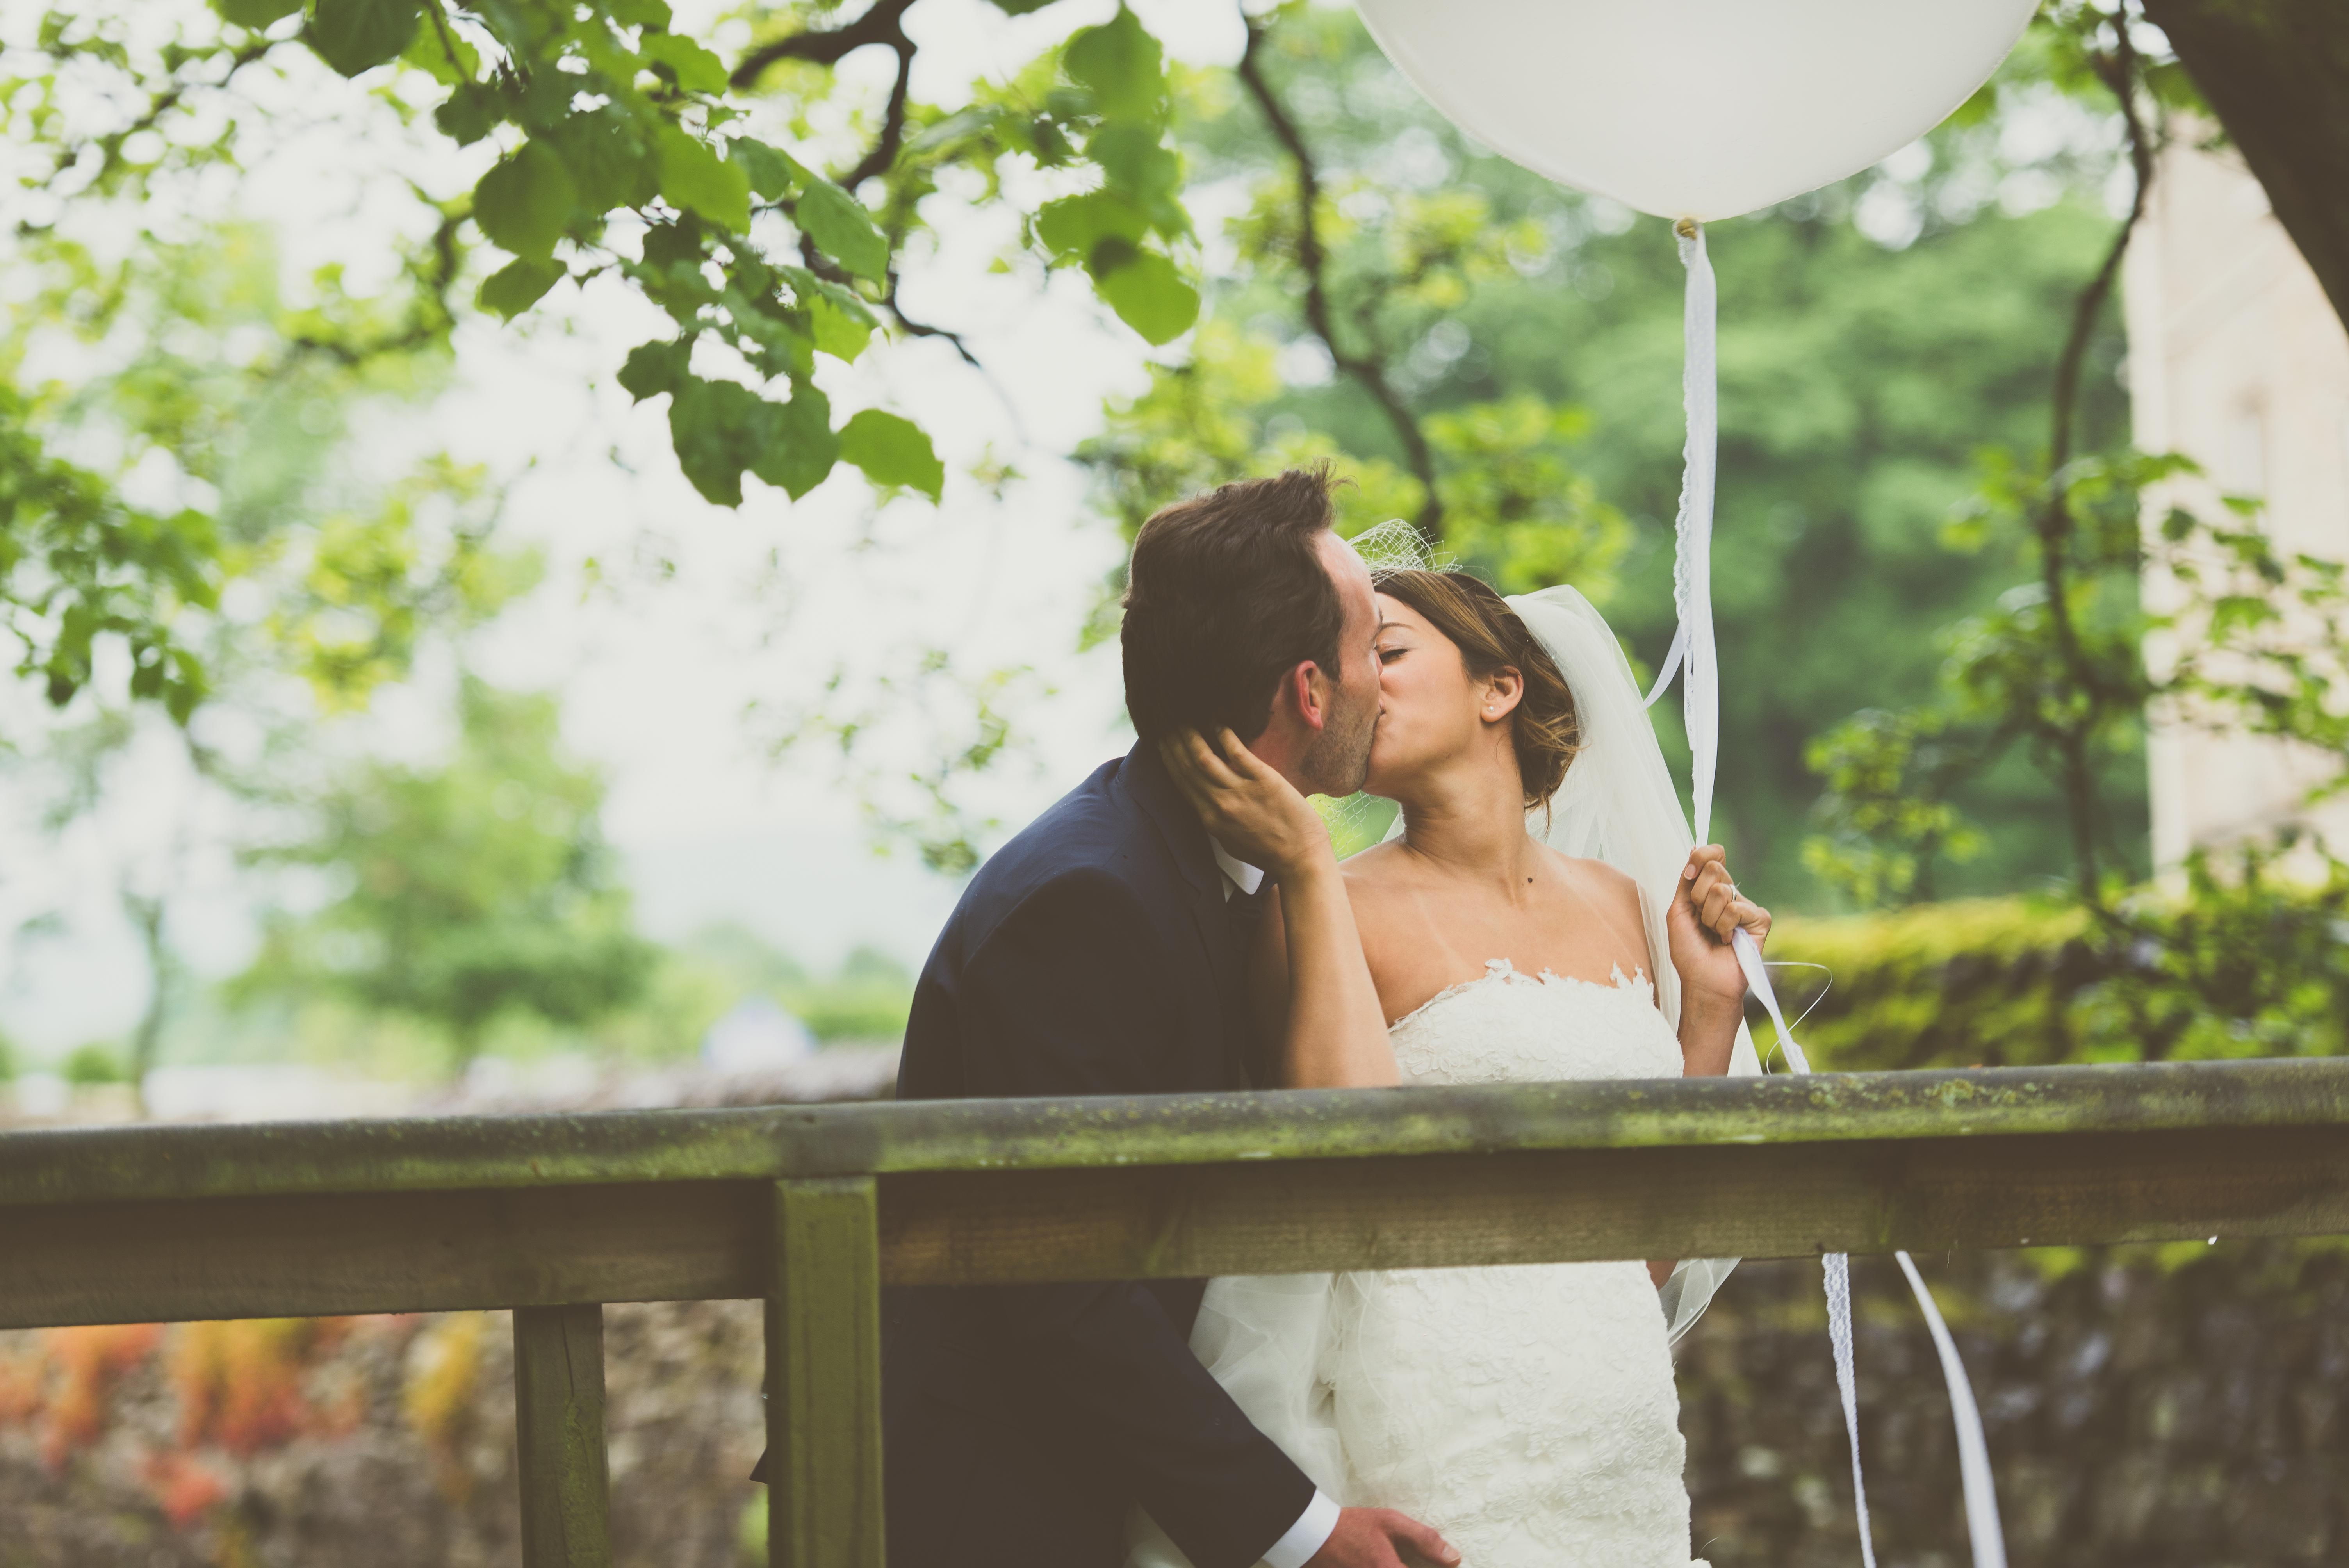 Yorkshire Wedding Planner, Yorkshire Wedding Stylist, Luxury Yorkshire Wedding Venue